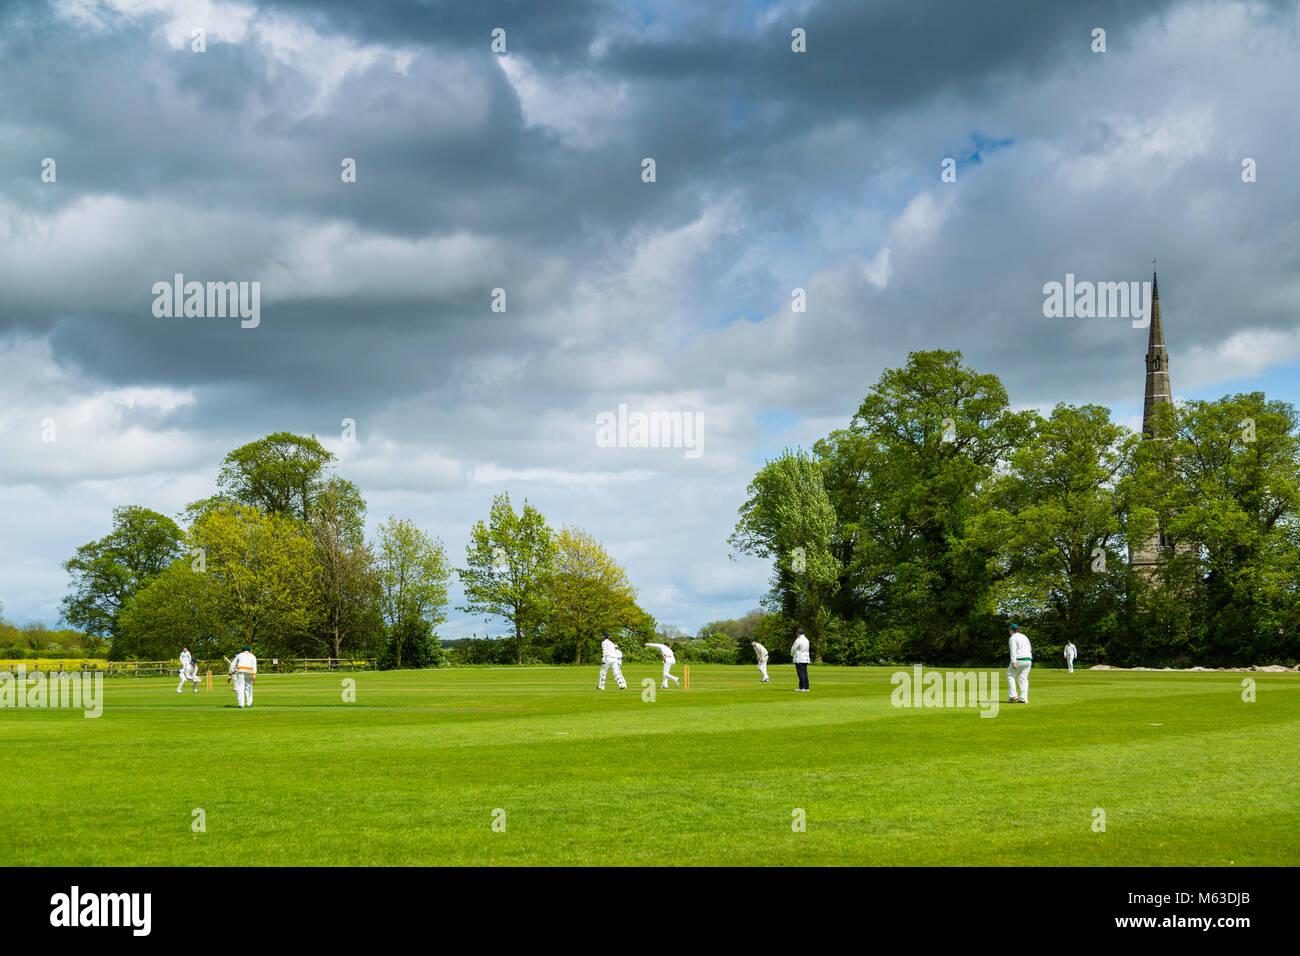 A cricket match on a village field under a stormy spring sky. - Stock Image